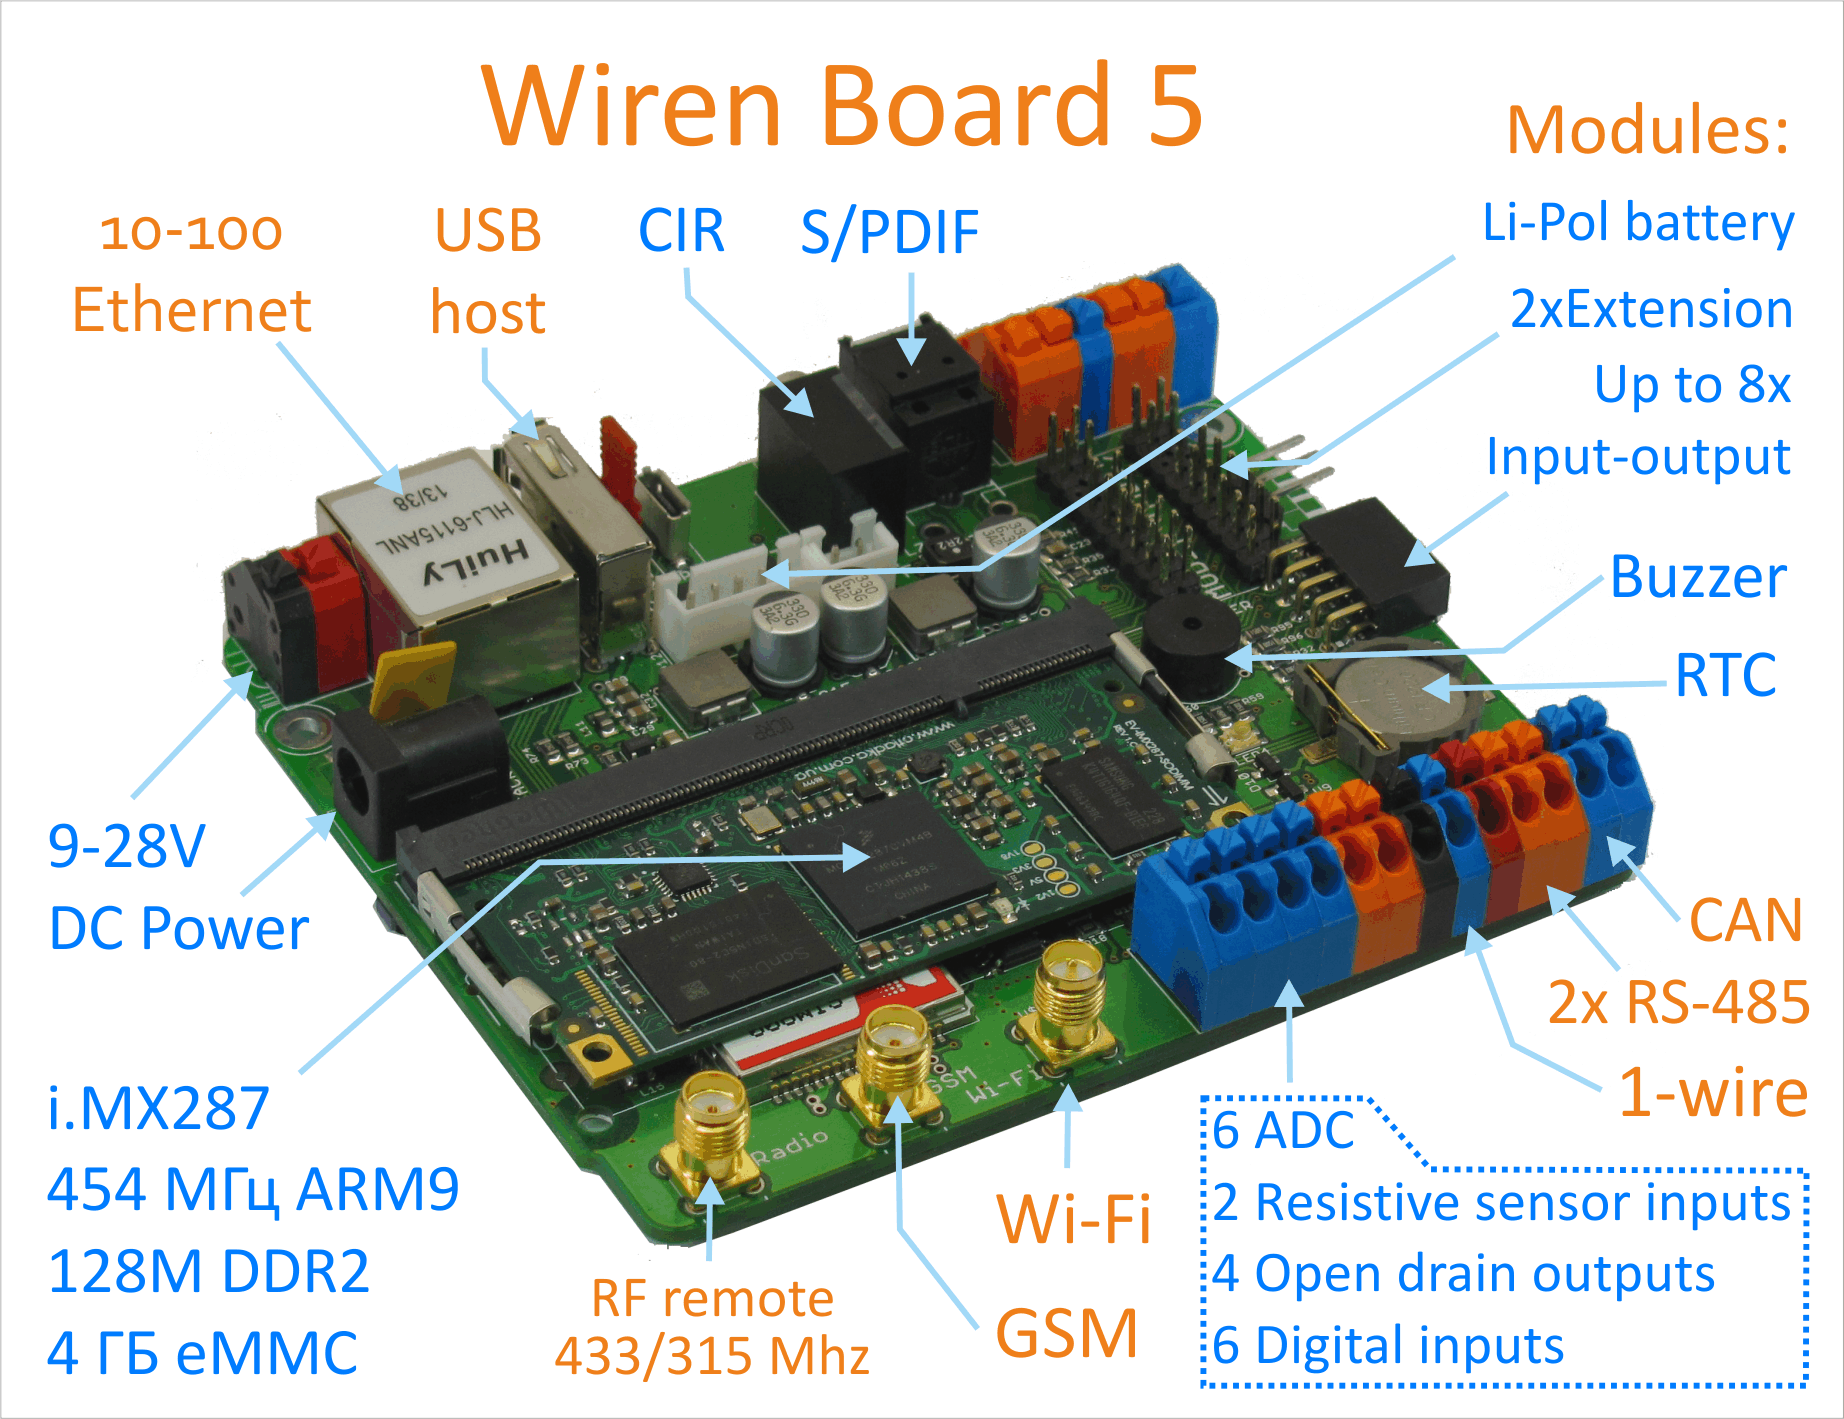 Wiren Board 5: снова на Хабре с новой версией контроллера для автоматизации - 2